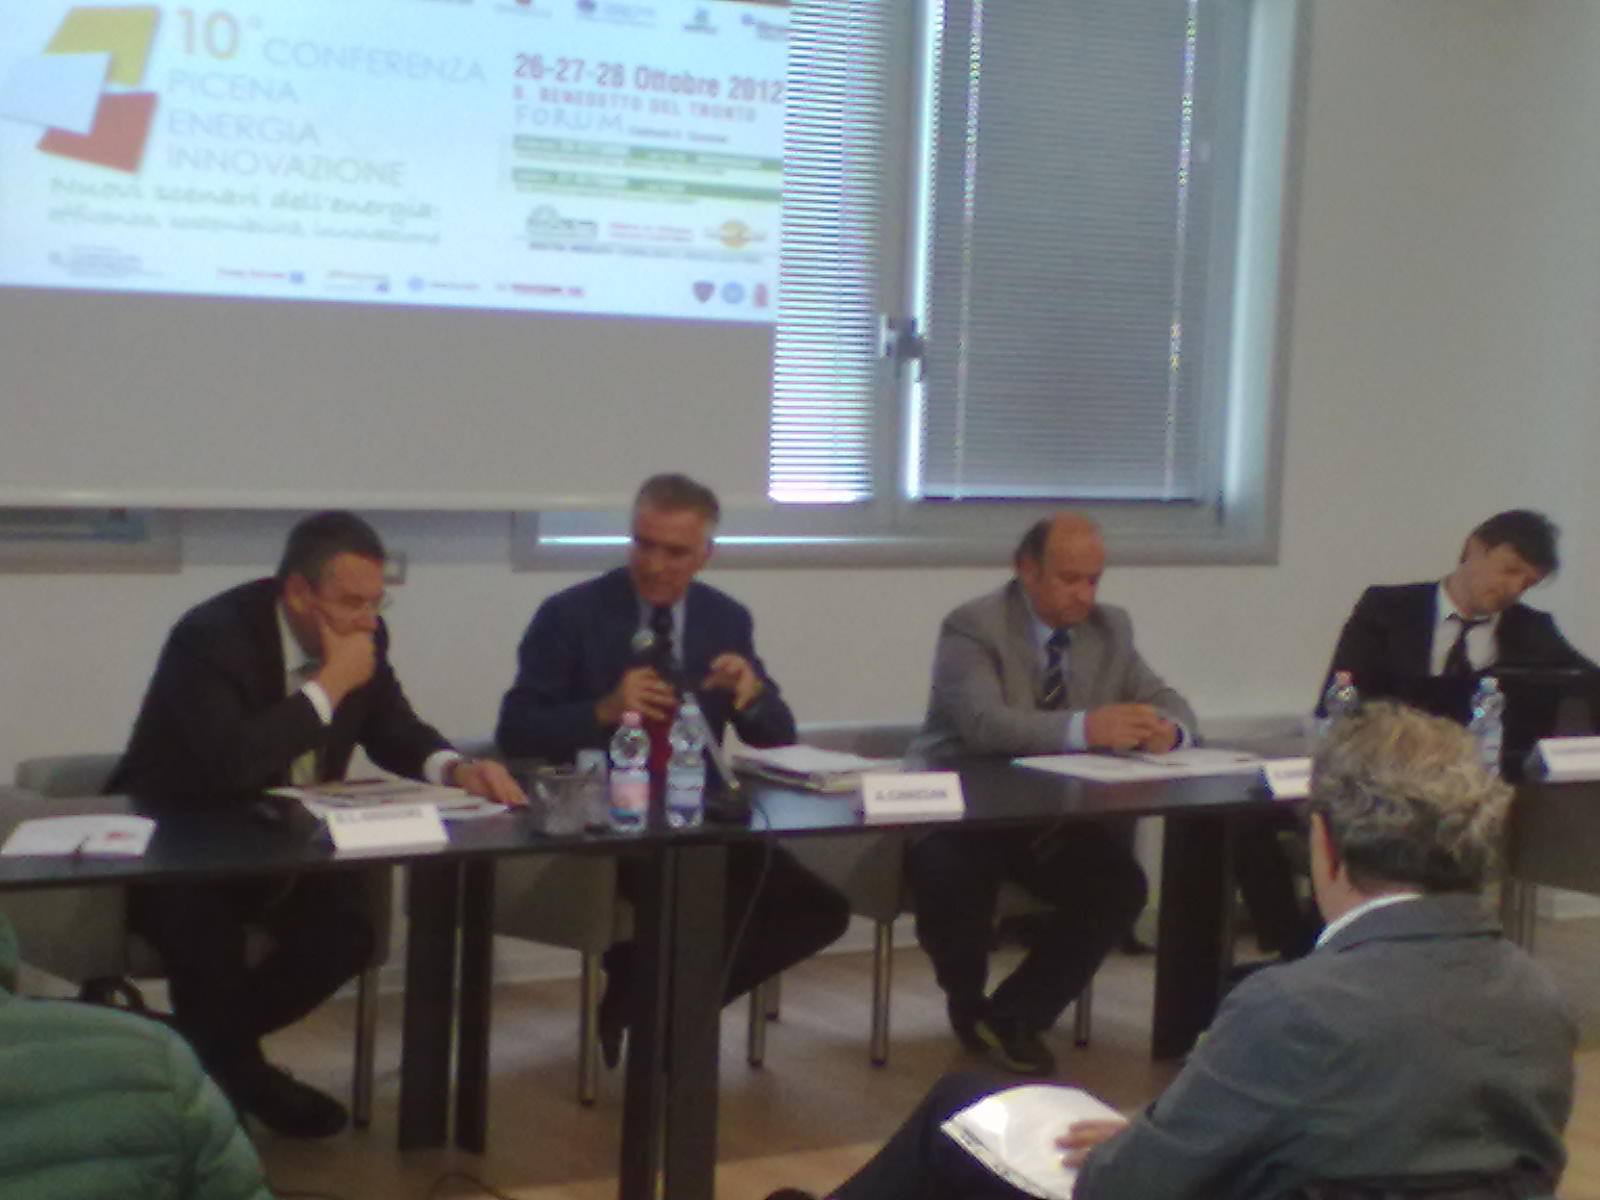 Conferenza nuove energie 2012